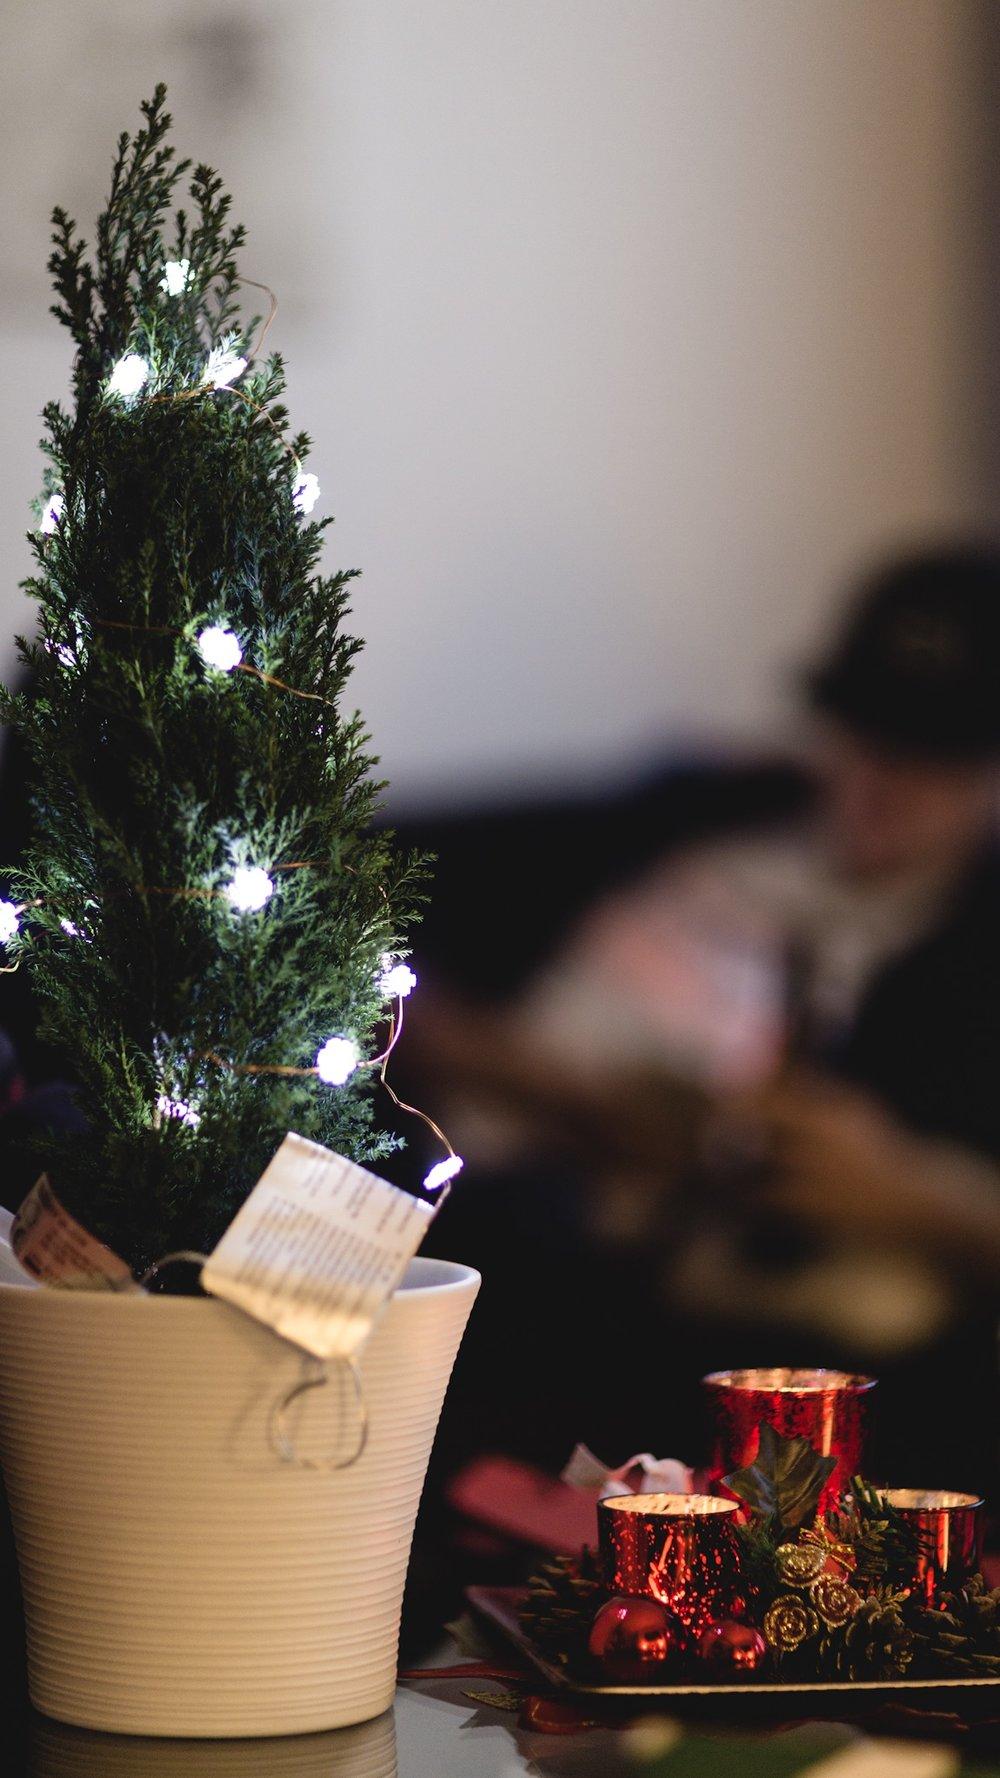 Christmas // Finland // December 2016